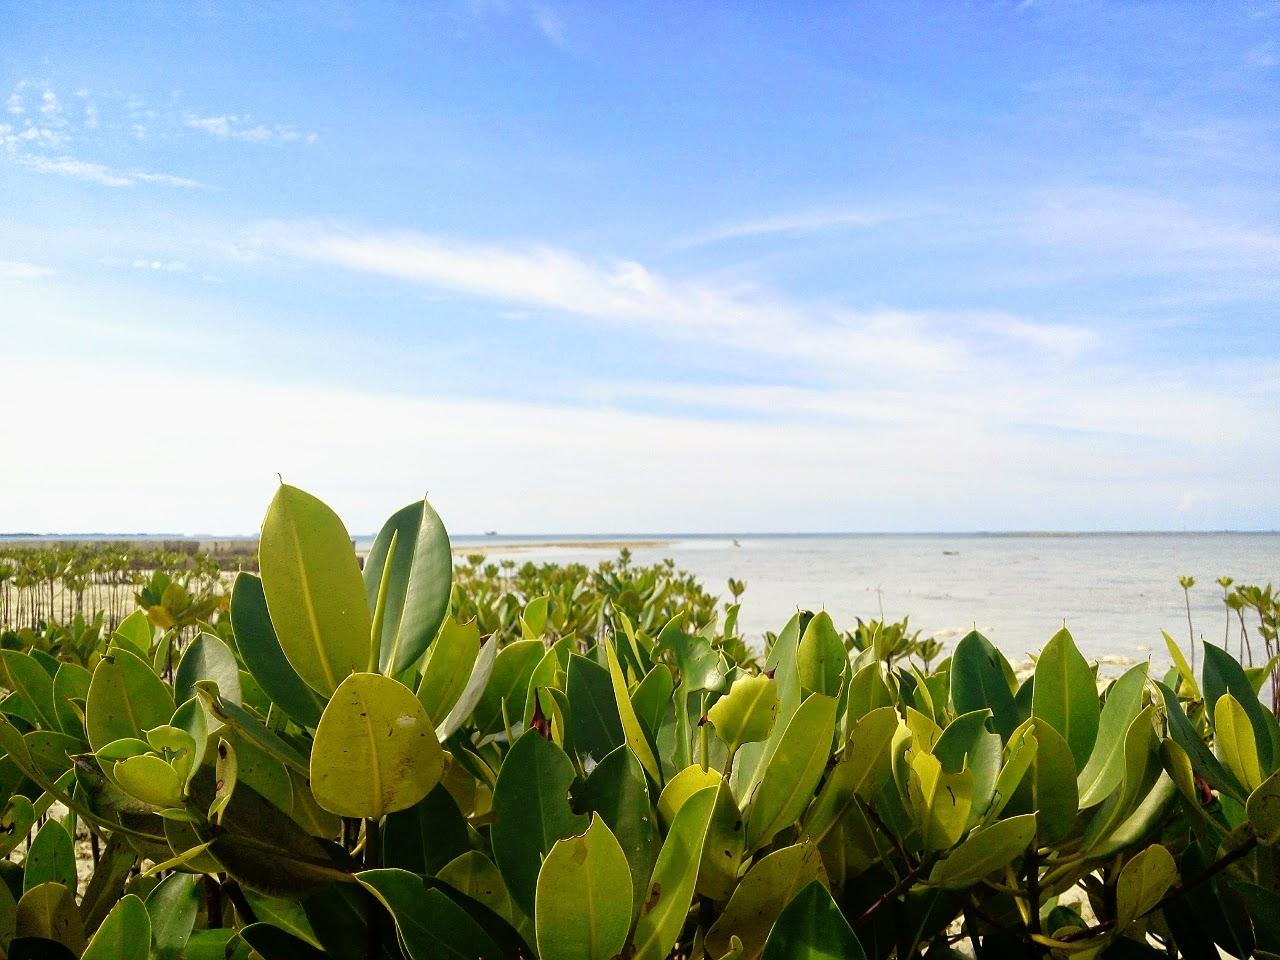 Pulau Indah, Kepulauan Seribu, Pulau Karya